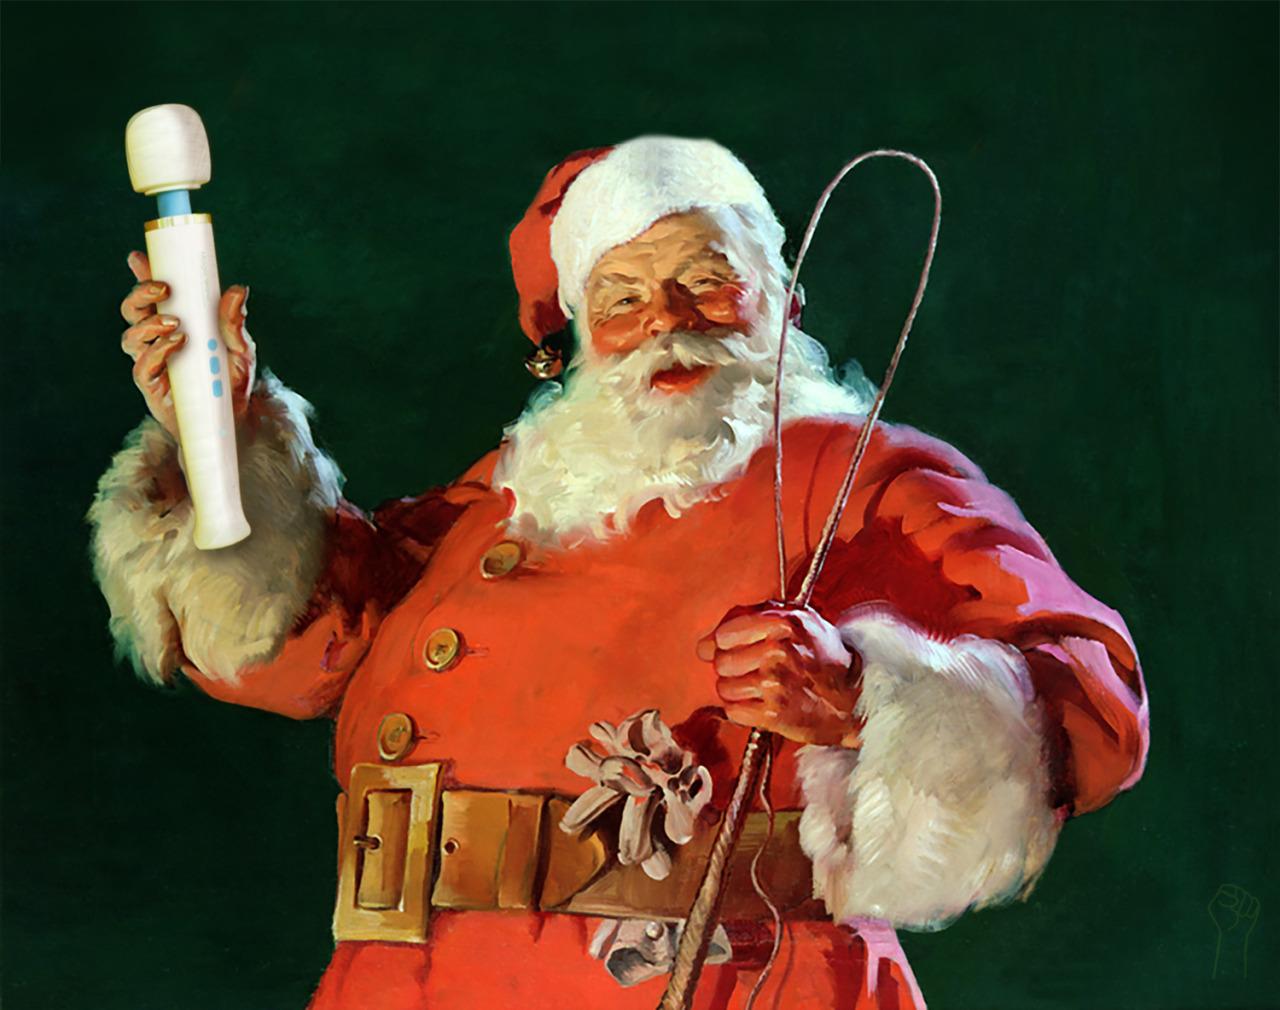 magic wand santa claus